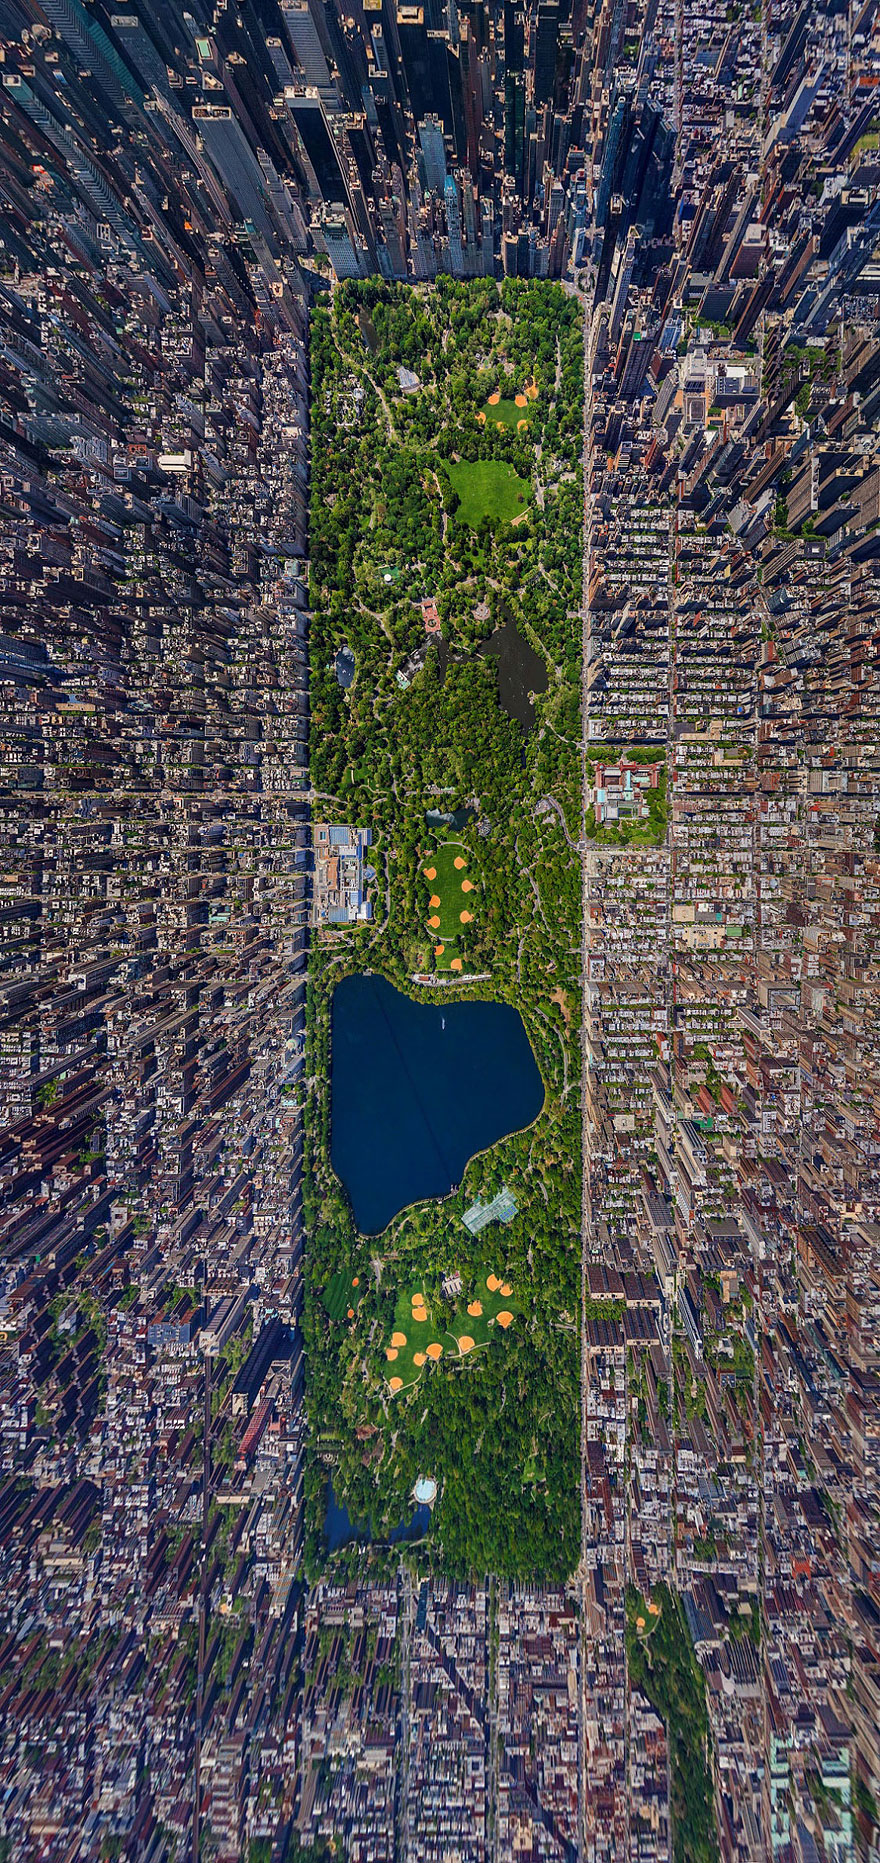 3. Центральный парк, Нью-Йорк, США